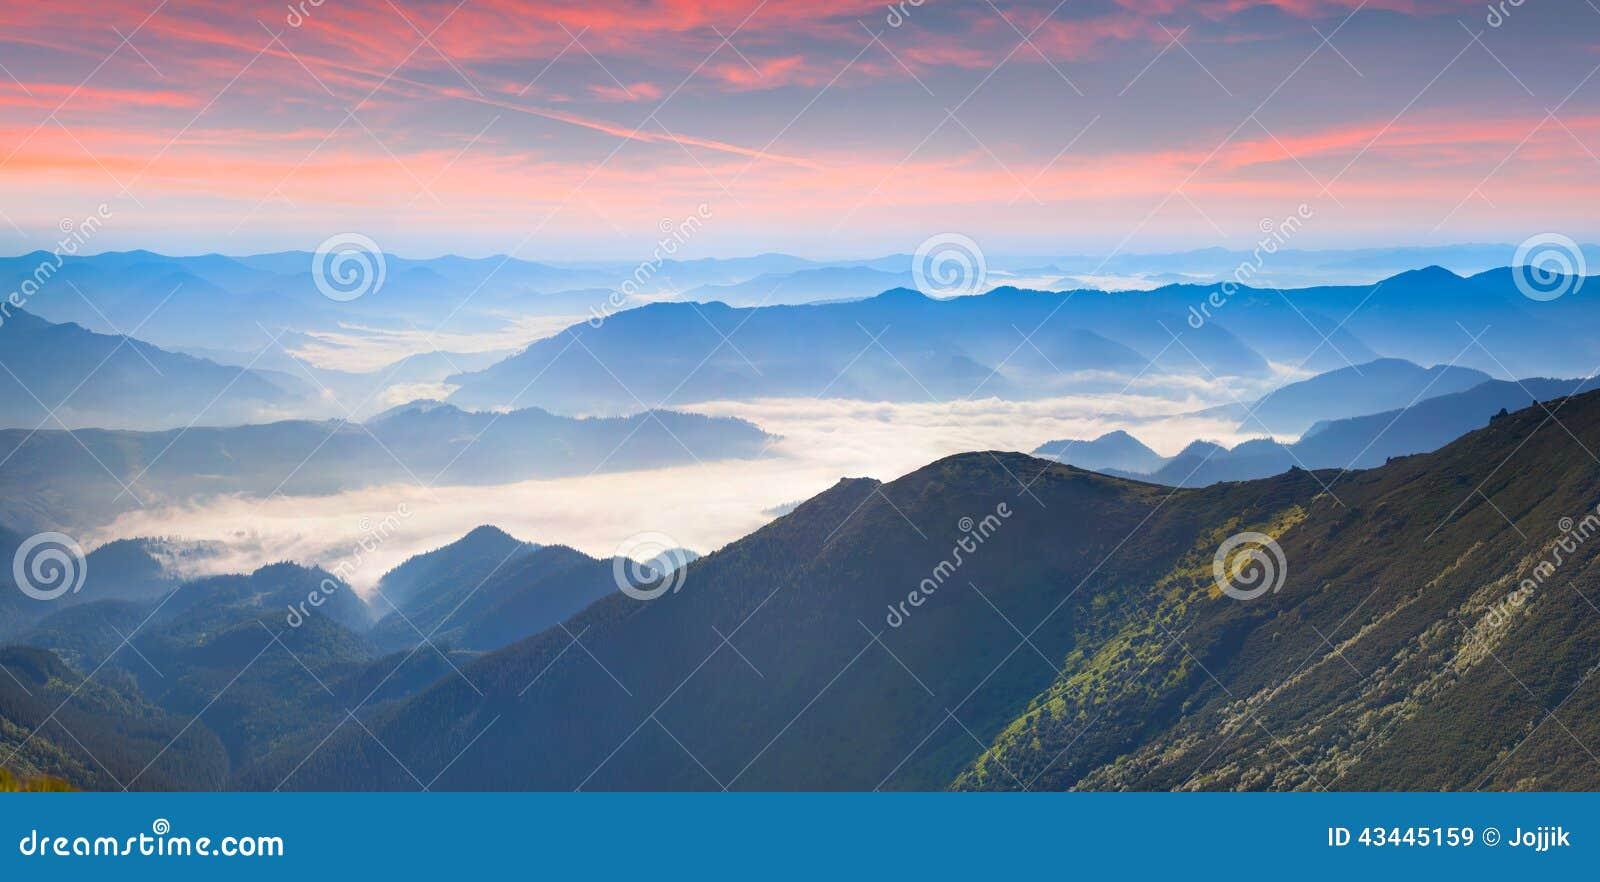 Nebeliges Sommerpanorama der Berge